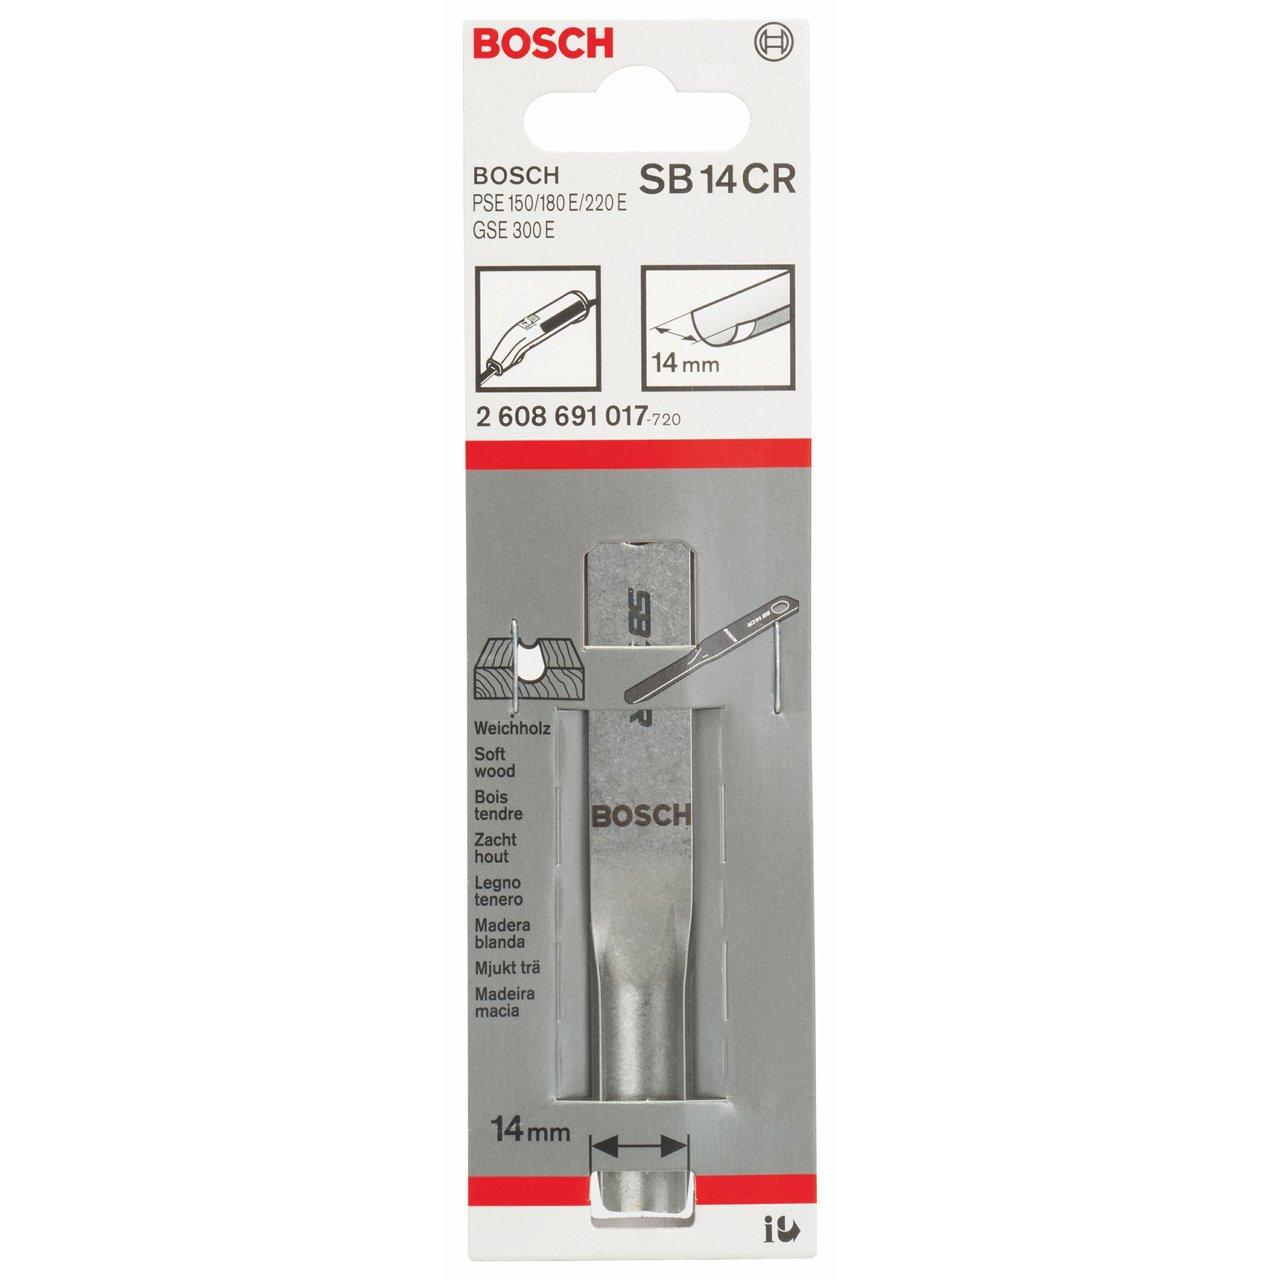 Bosch 2608691017 Gouge Wood Chisel SB 14 CR for Bosch Electric Scraper Robert Bosch Limited